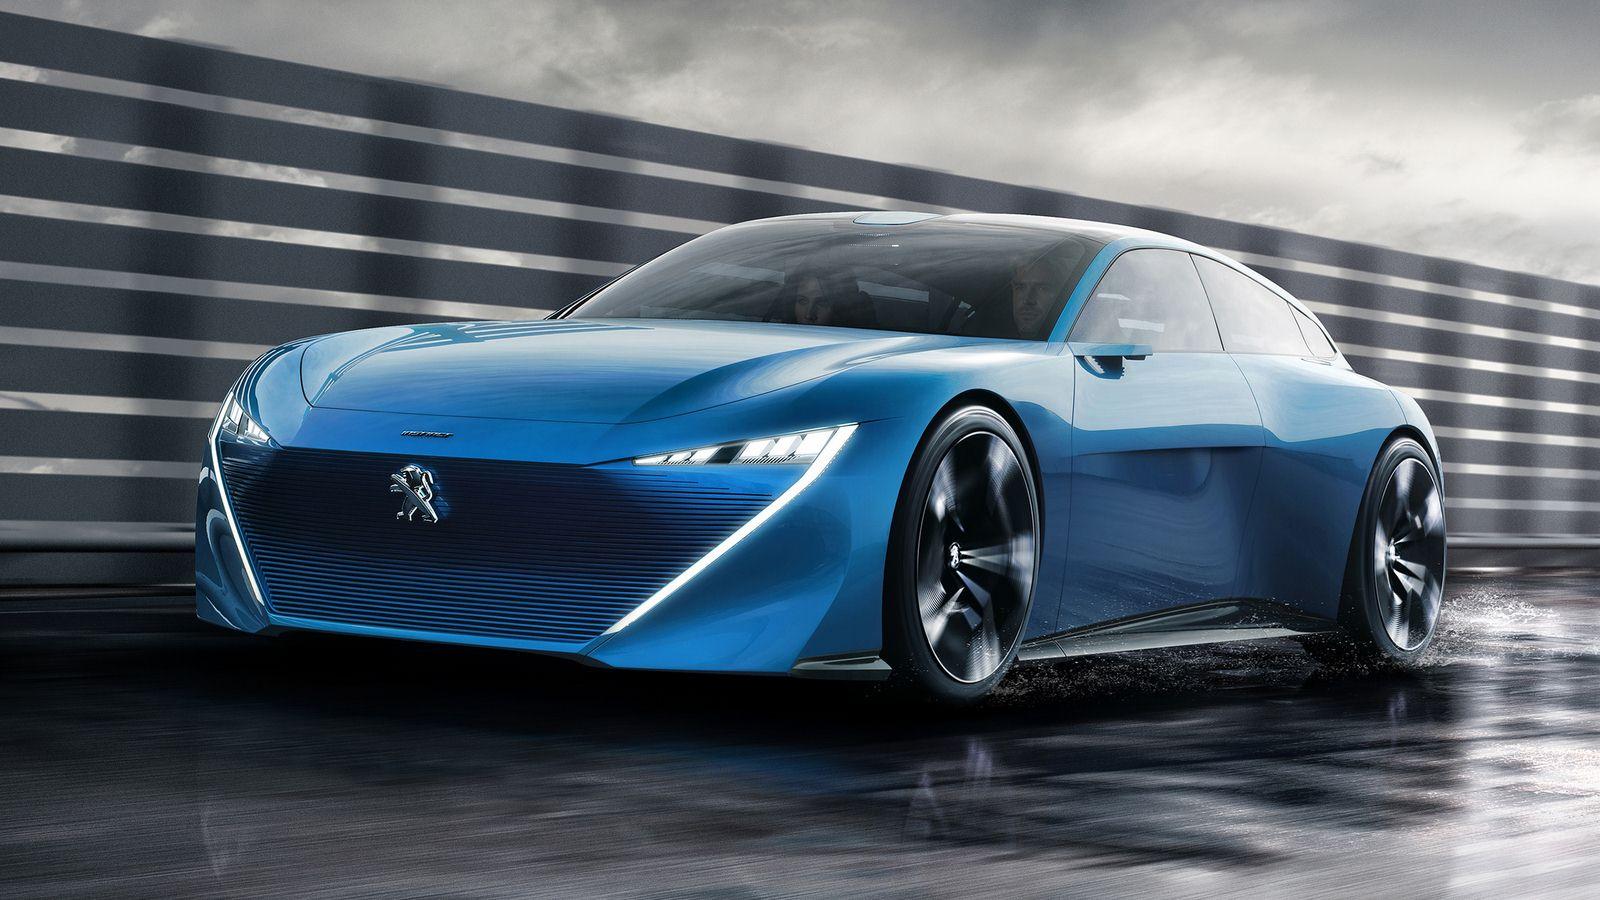 2017-Peugeot-Instinct-Concept-16